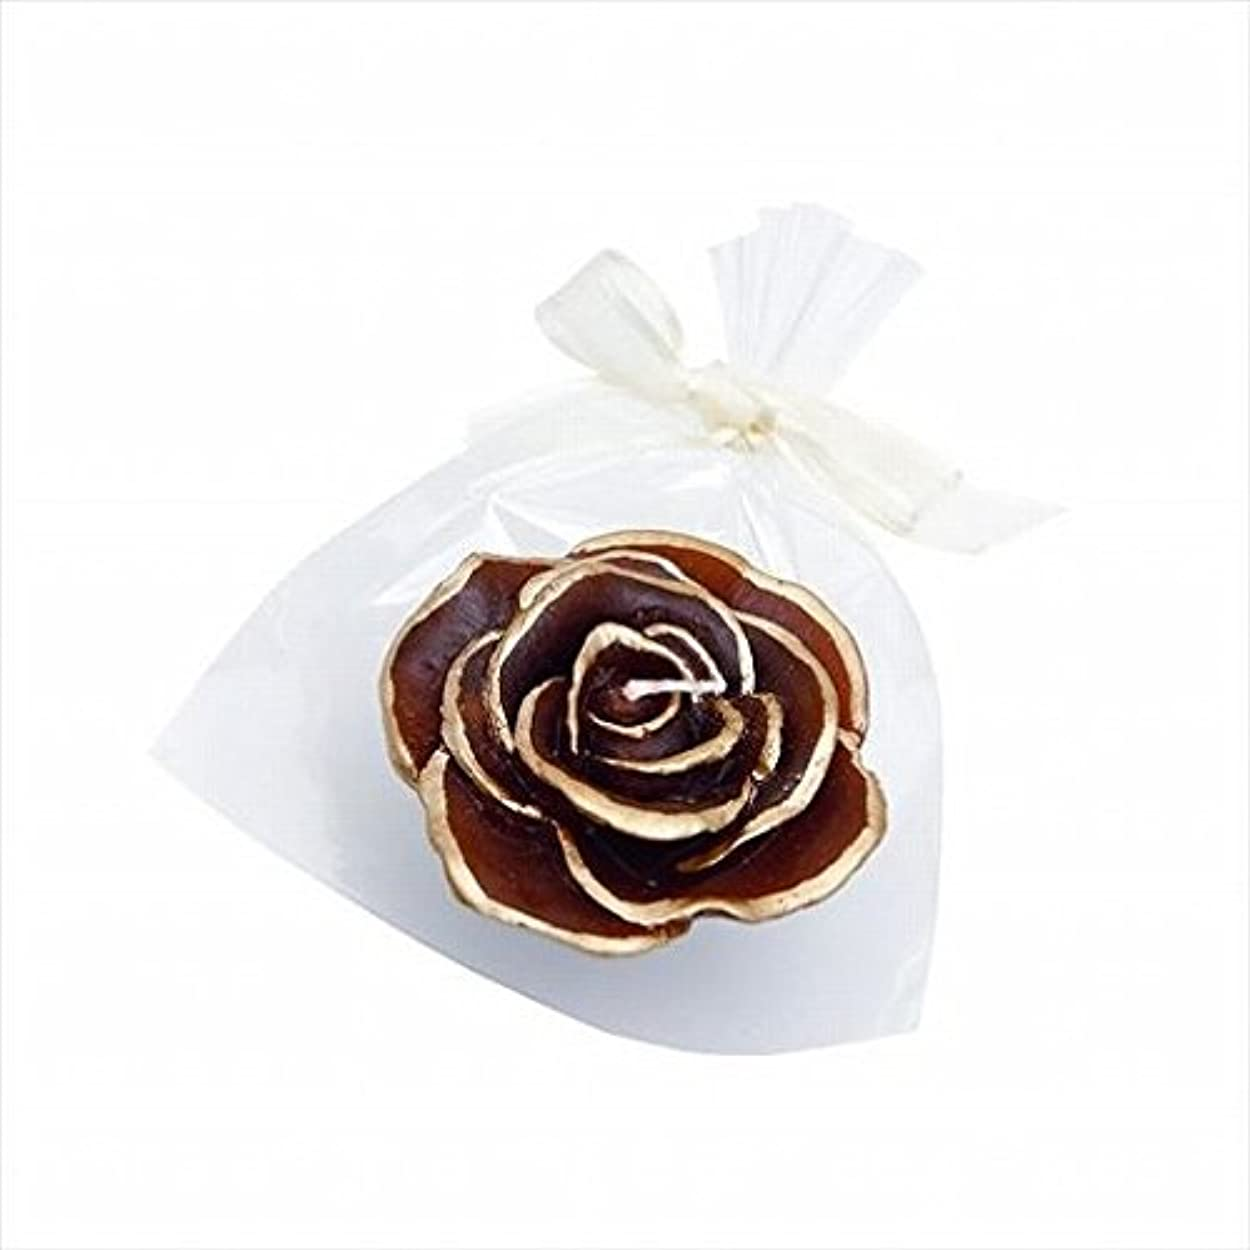 kameyama candle(カメヤマキャンドル) プリンセスローズ 「 チョコレート 」(A6390500CH)